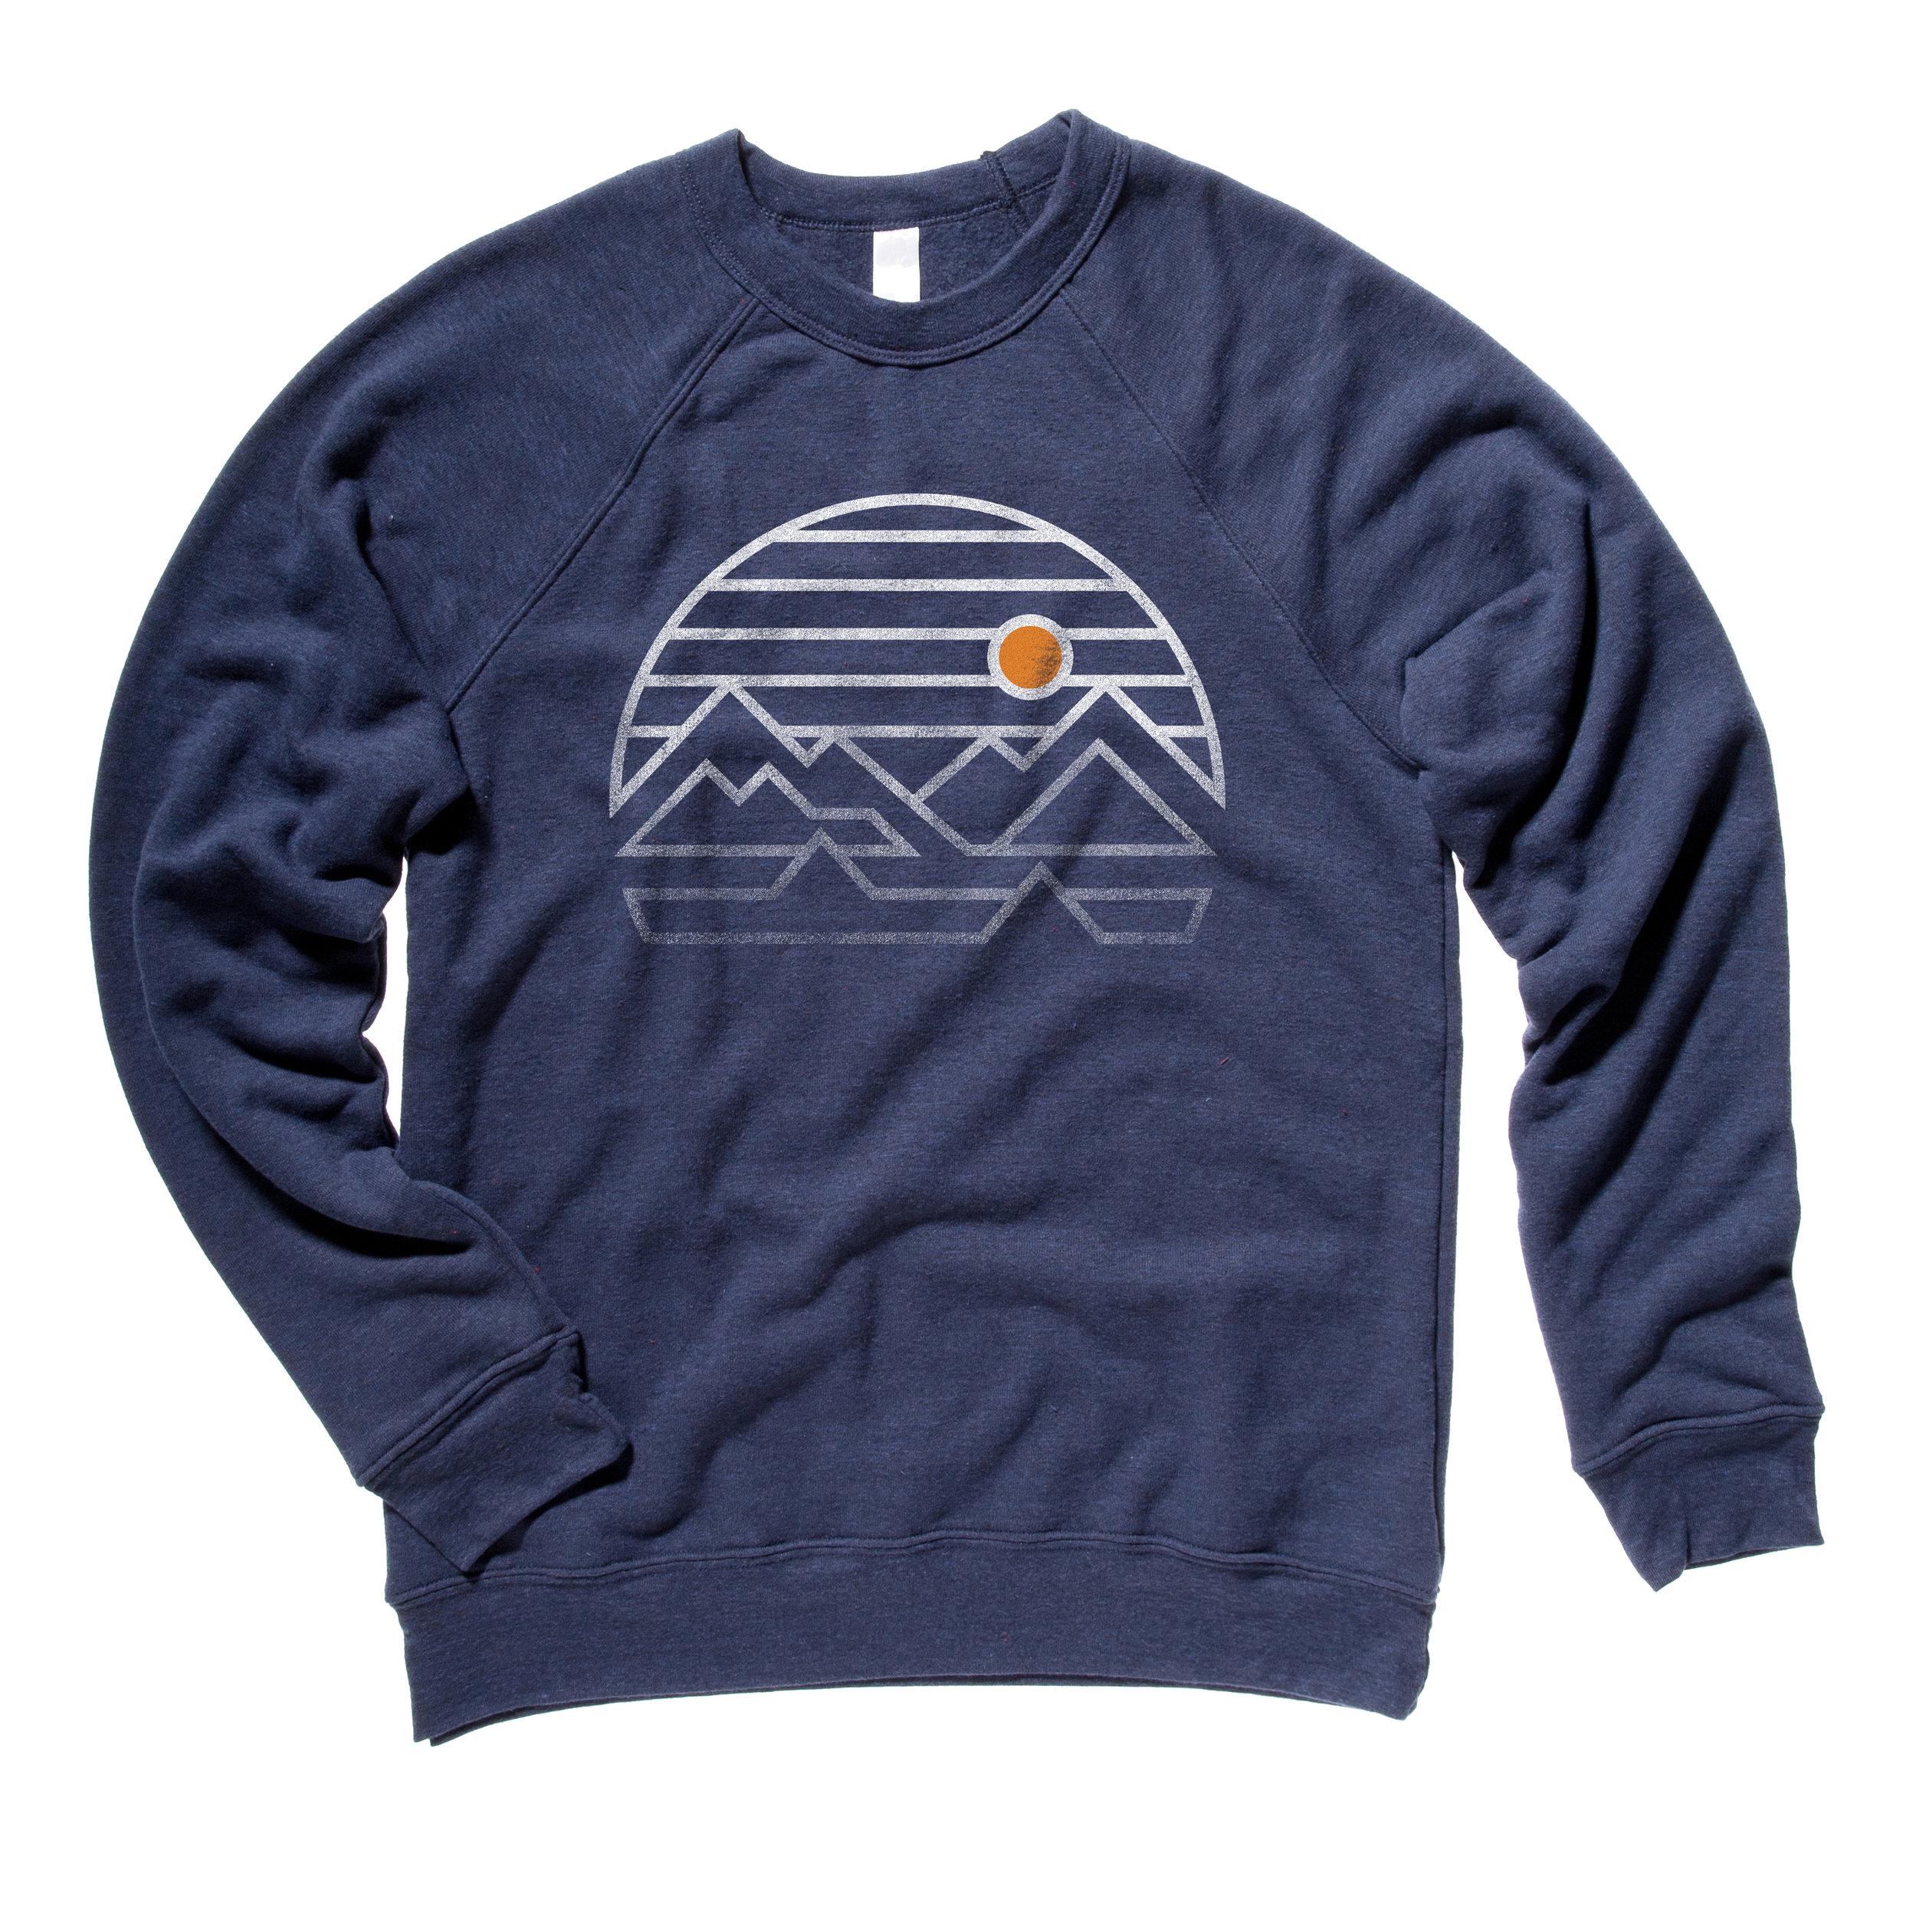 Blue-Moon-Brewery-Colorado-Lifestyle-Crewneck-Sweater.jpg